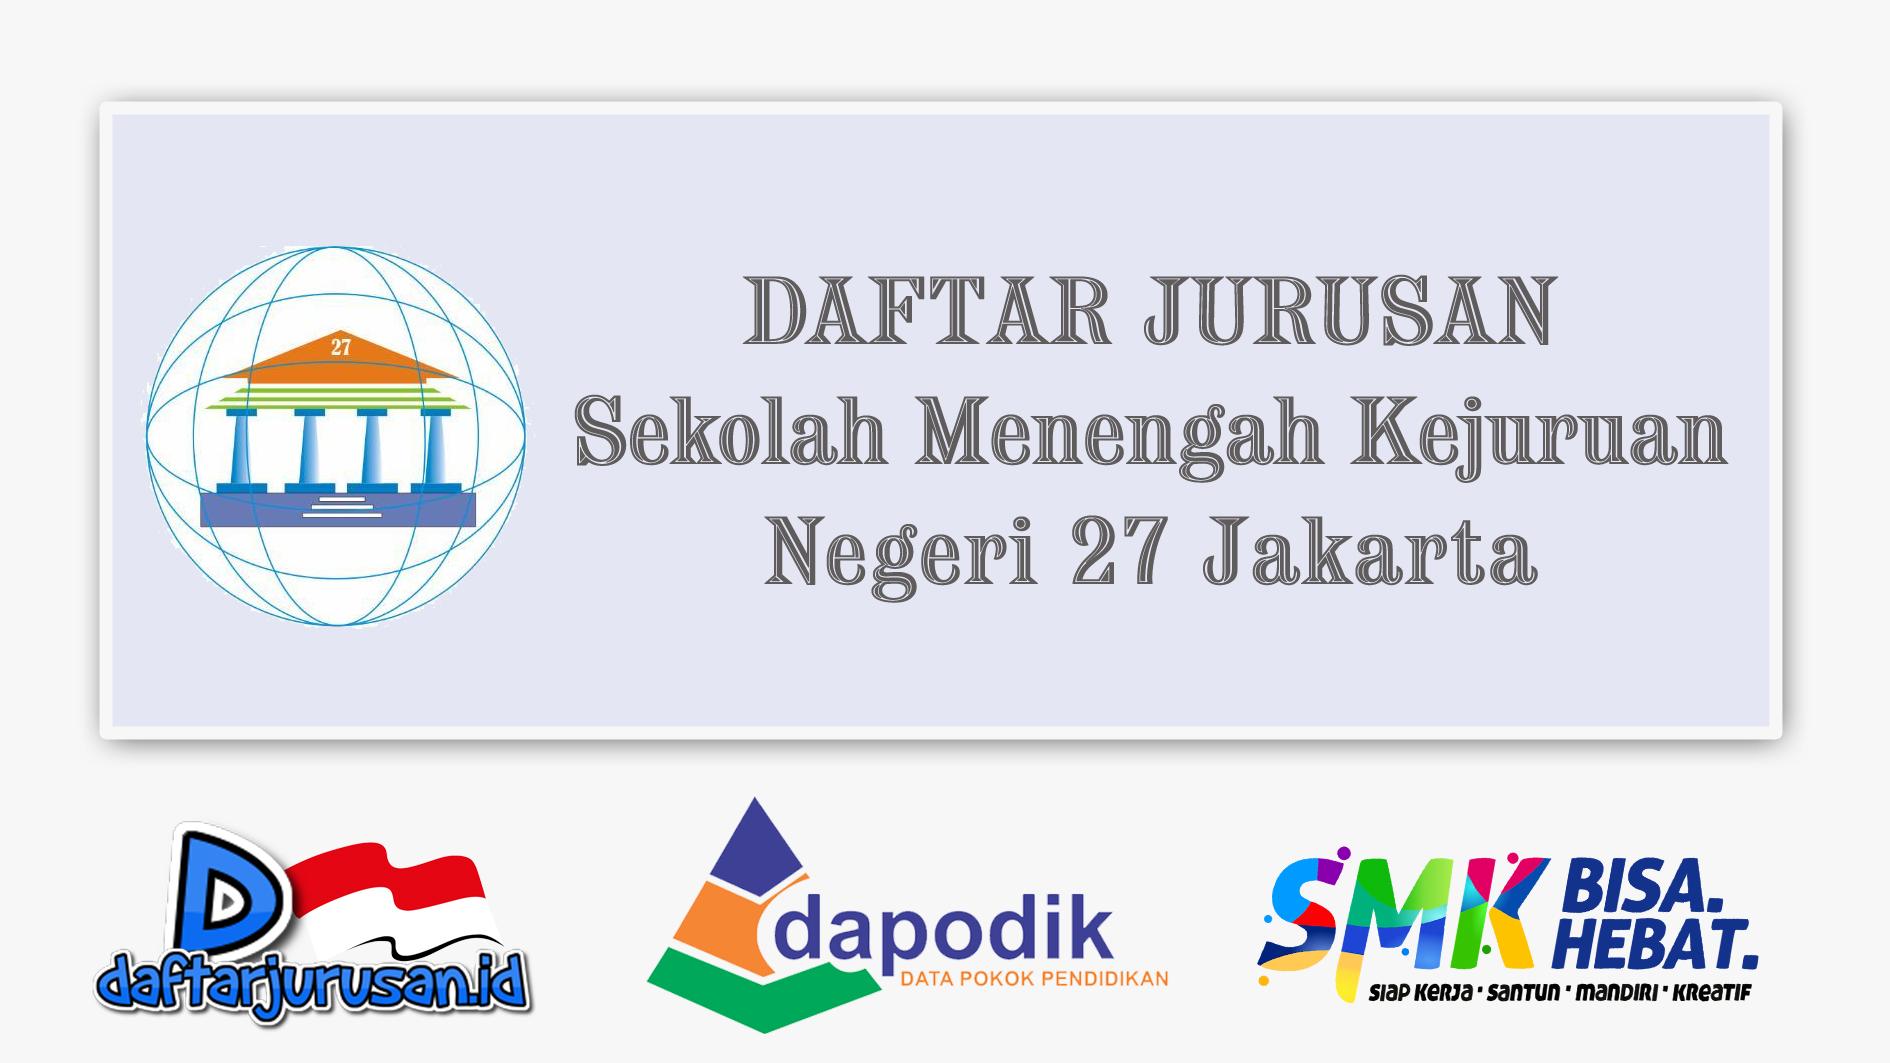 Daftar Jurusan SMK Negeri 27 Jakarta Pusat